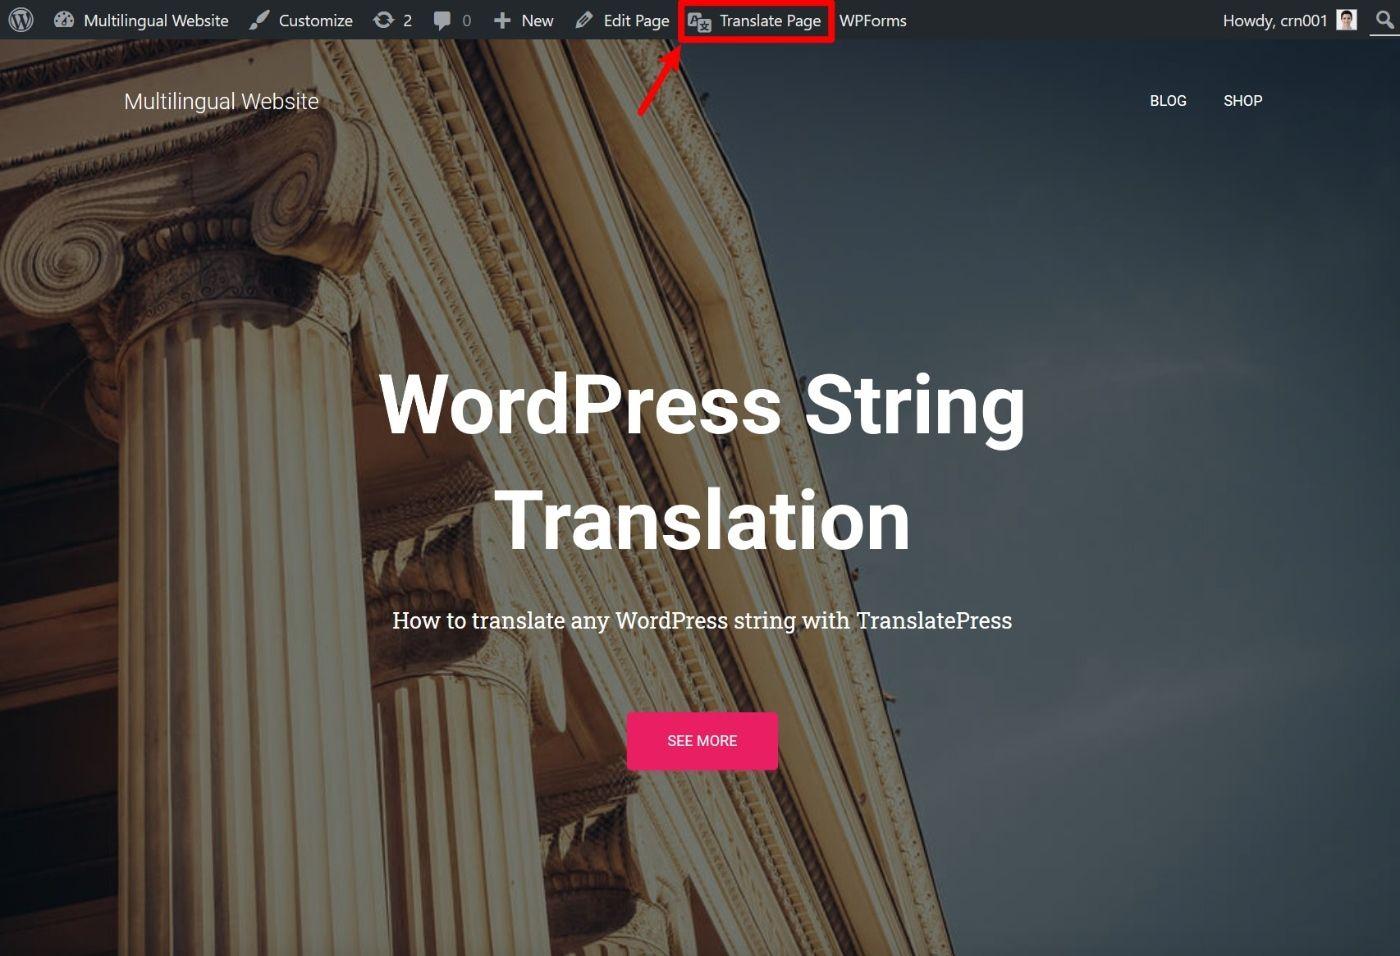 Open translation editor